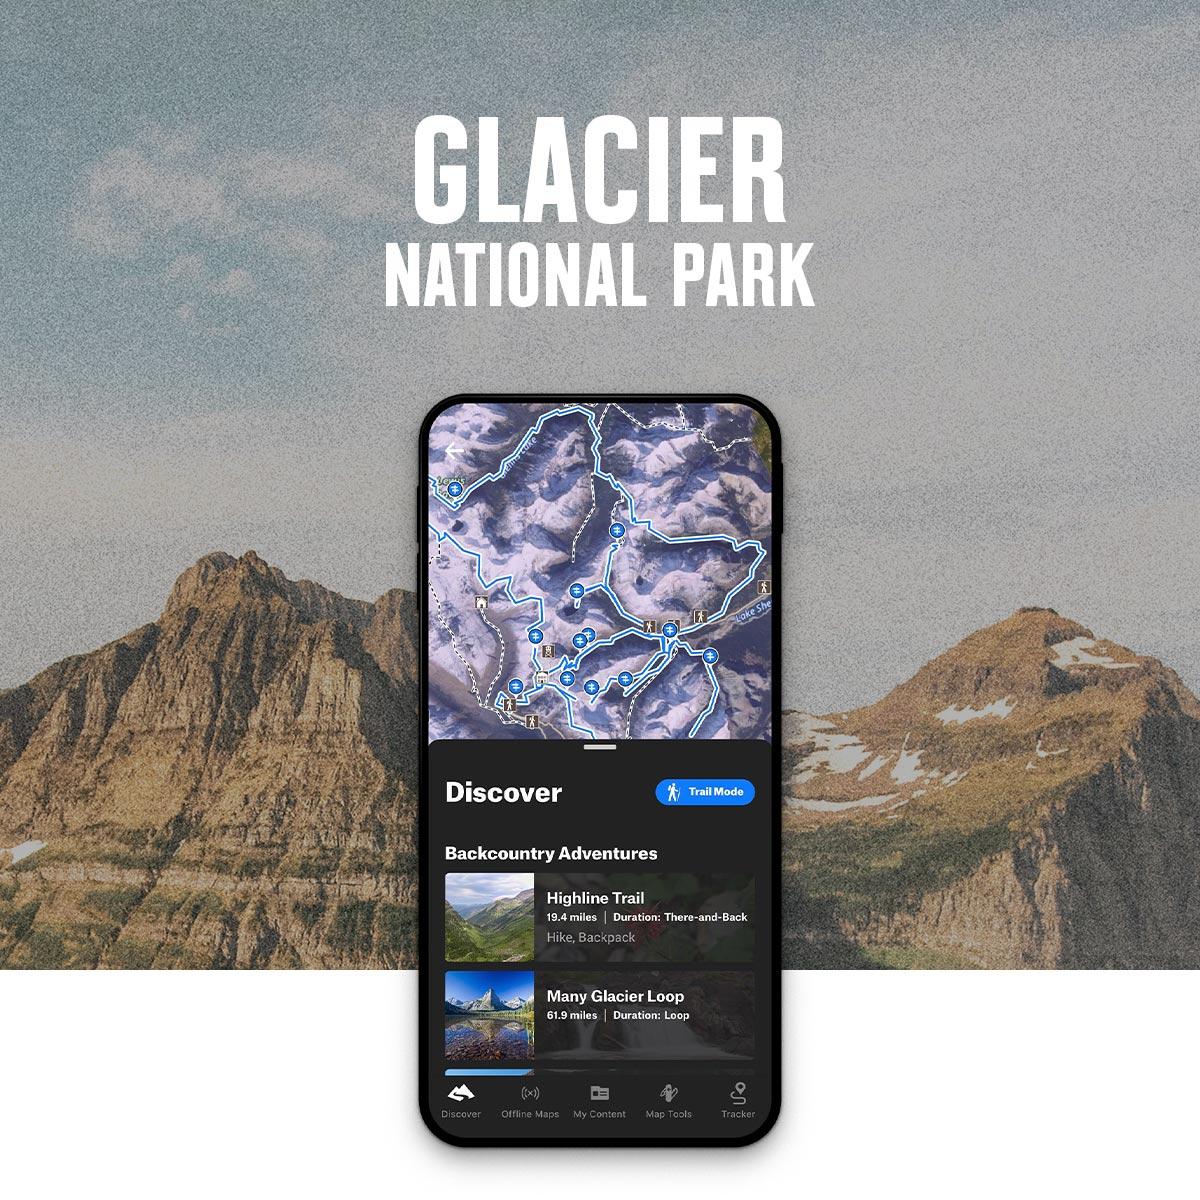 National Park Week Glacier National Park Featured Adventure